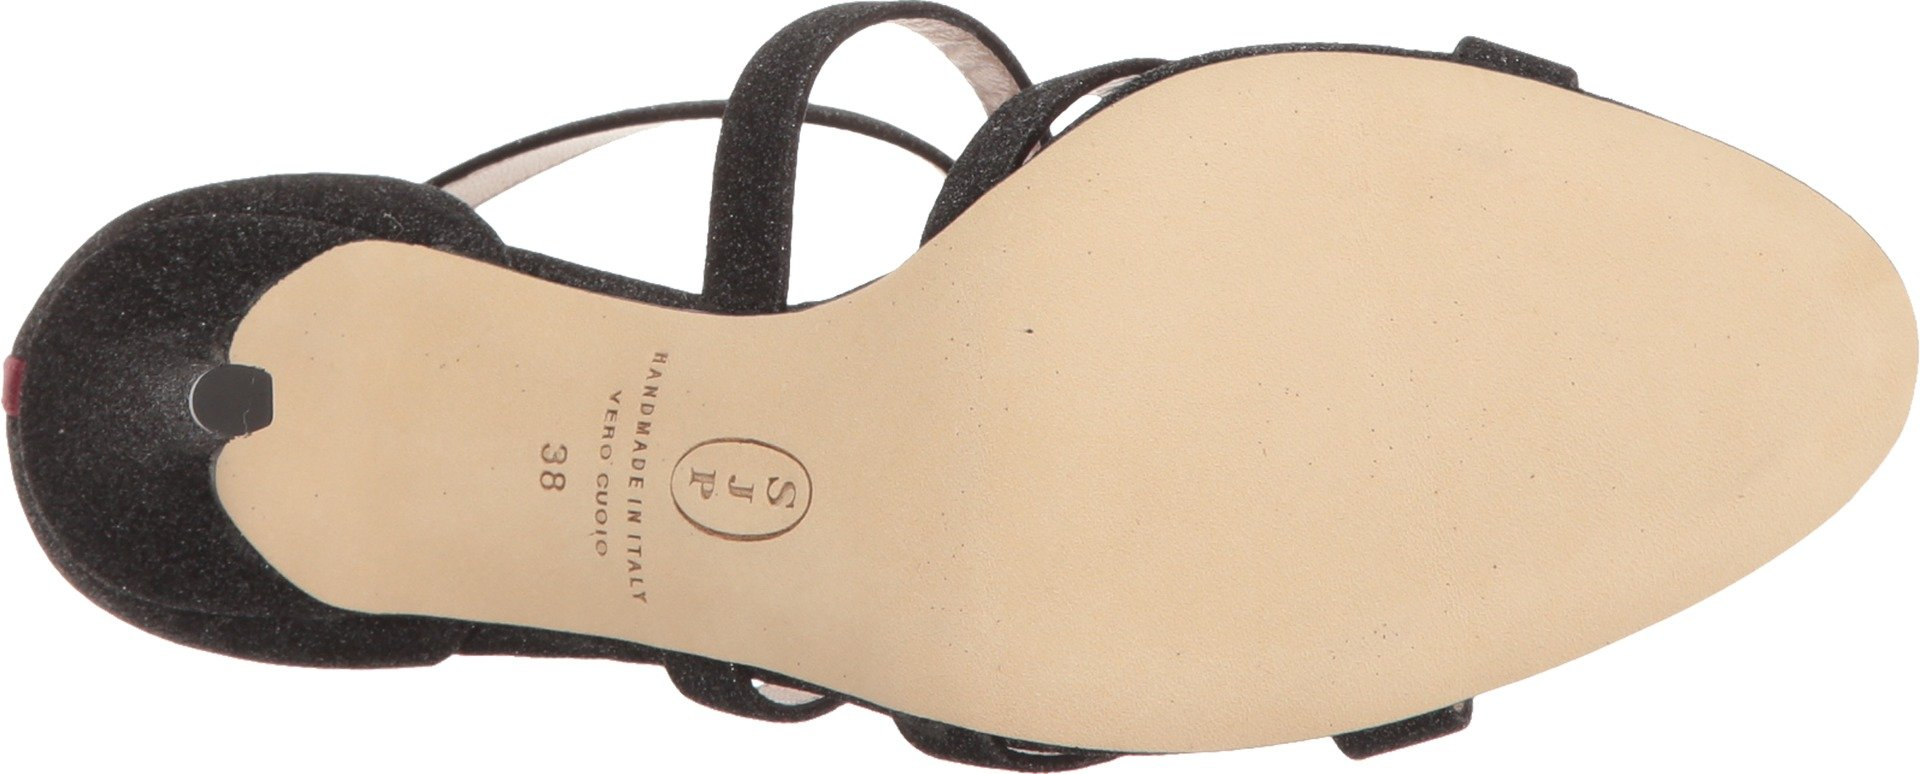 SJP by Sarah Jessica Parker Women's Strut Dress Sandal, Doozy Fine Glitter Black, 38.5 EU/8 B US